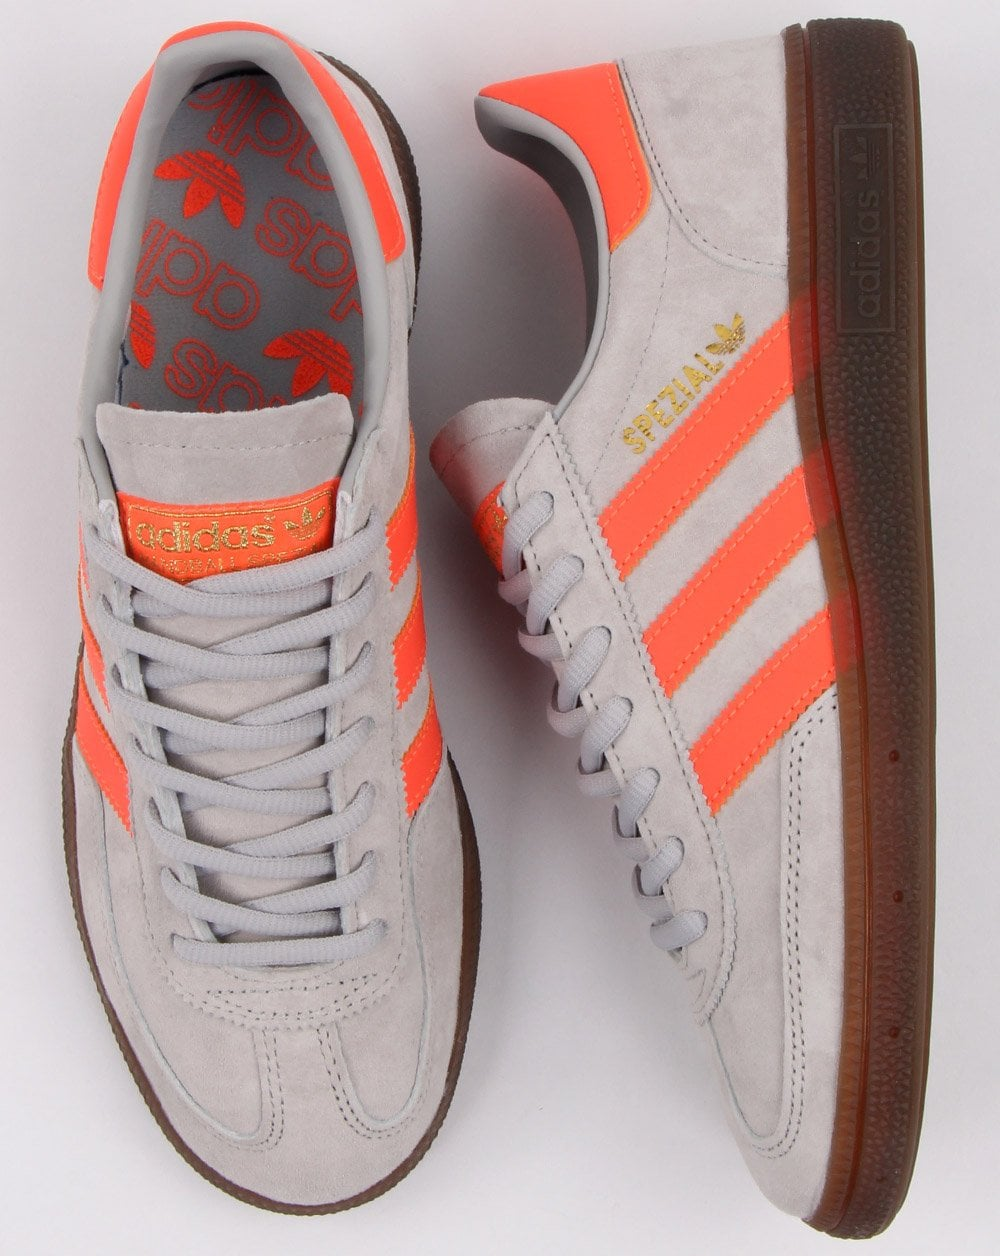 Adidas Spezial red | The Shoe Game | Adidas spezial, Adidas